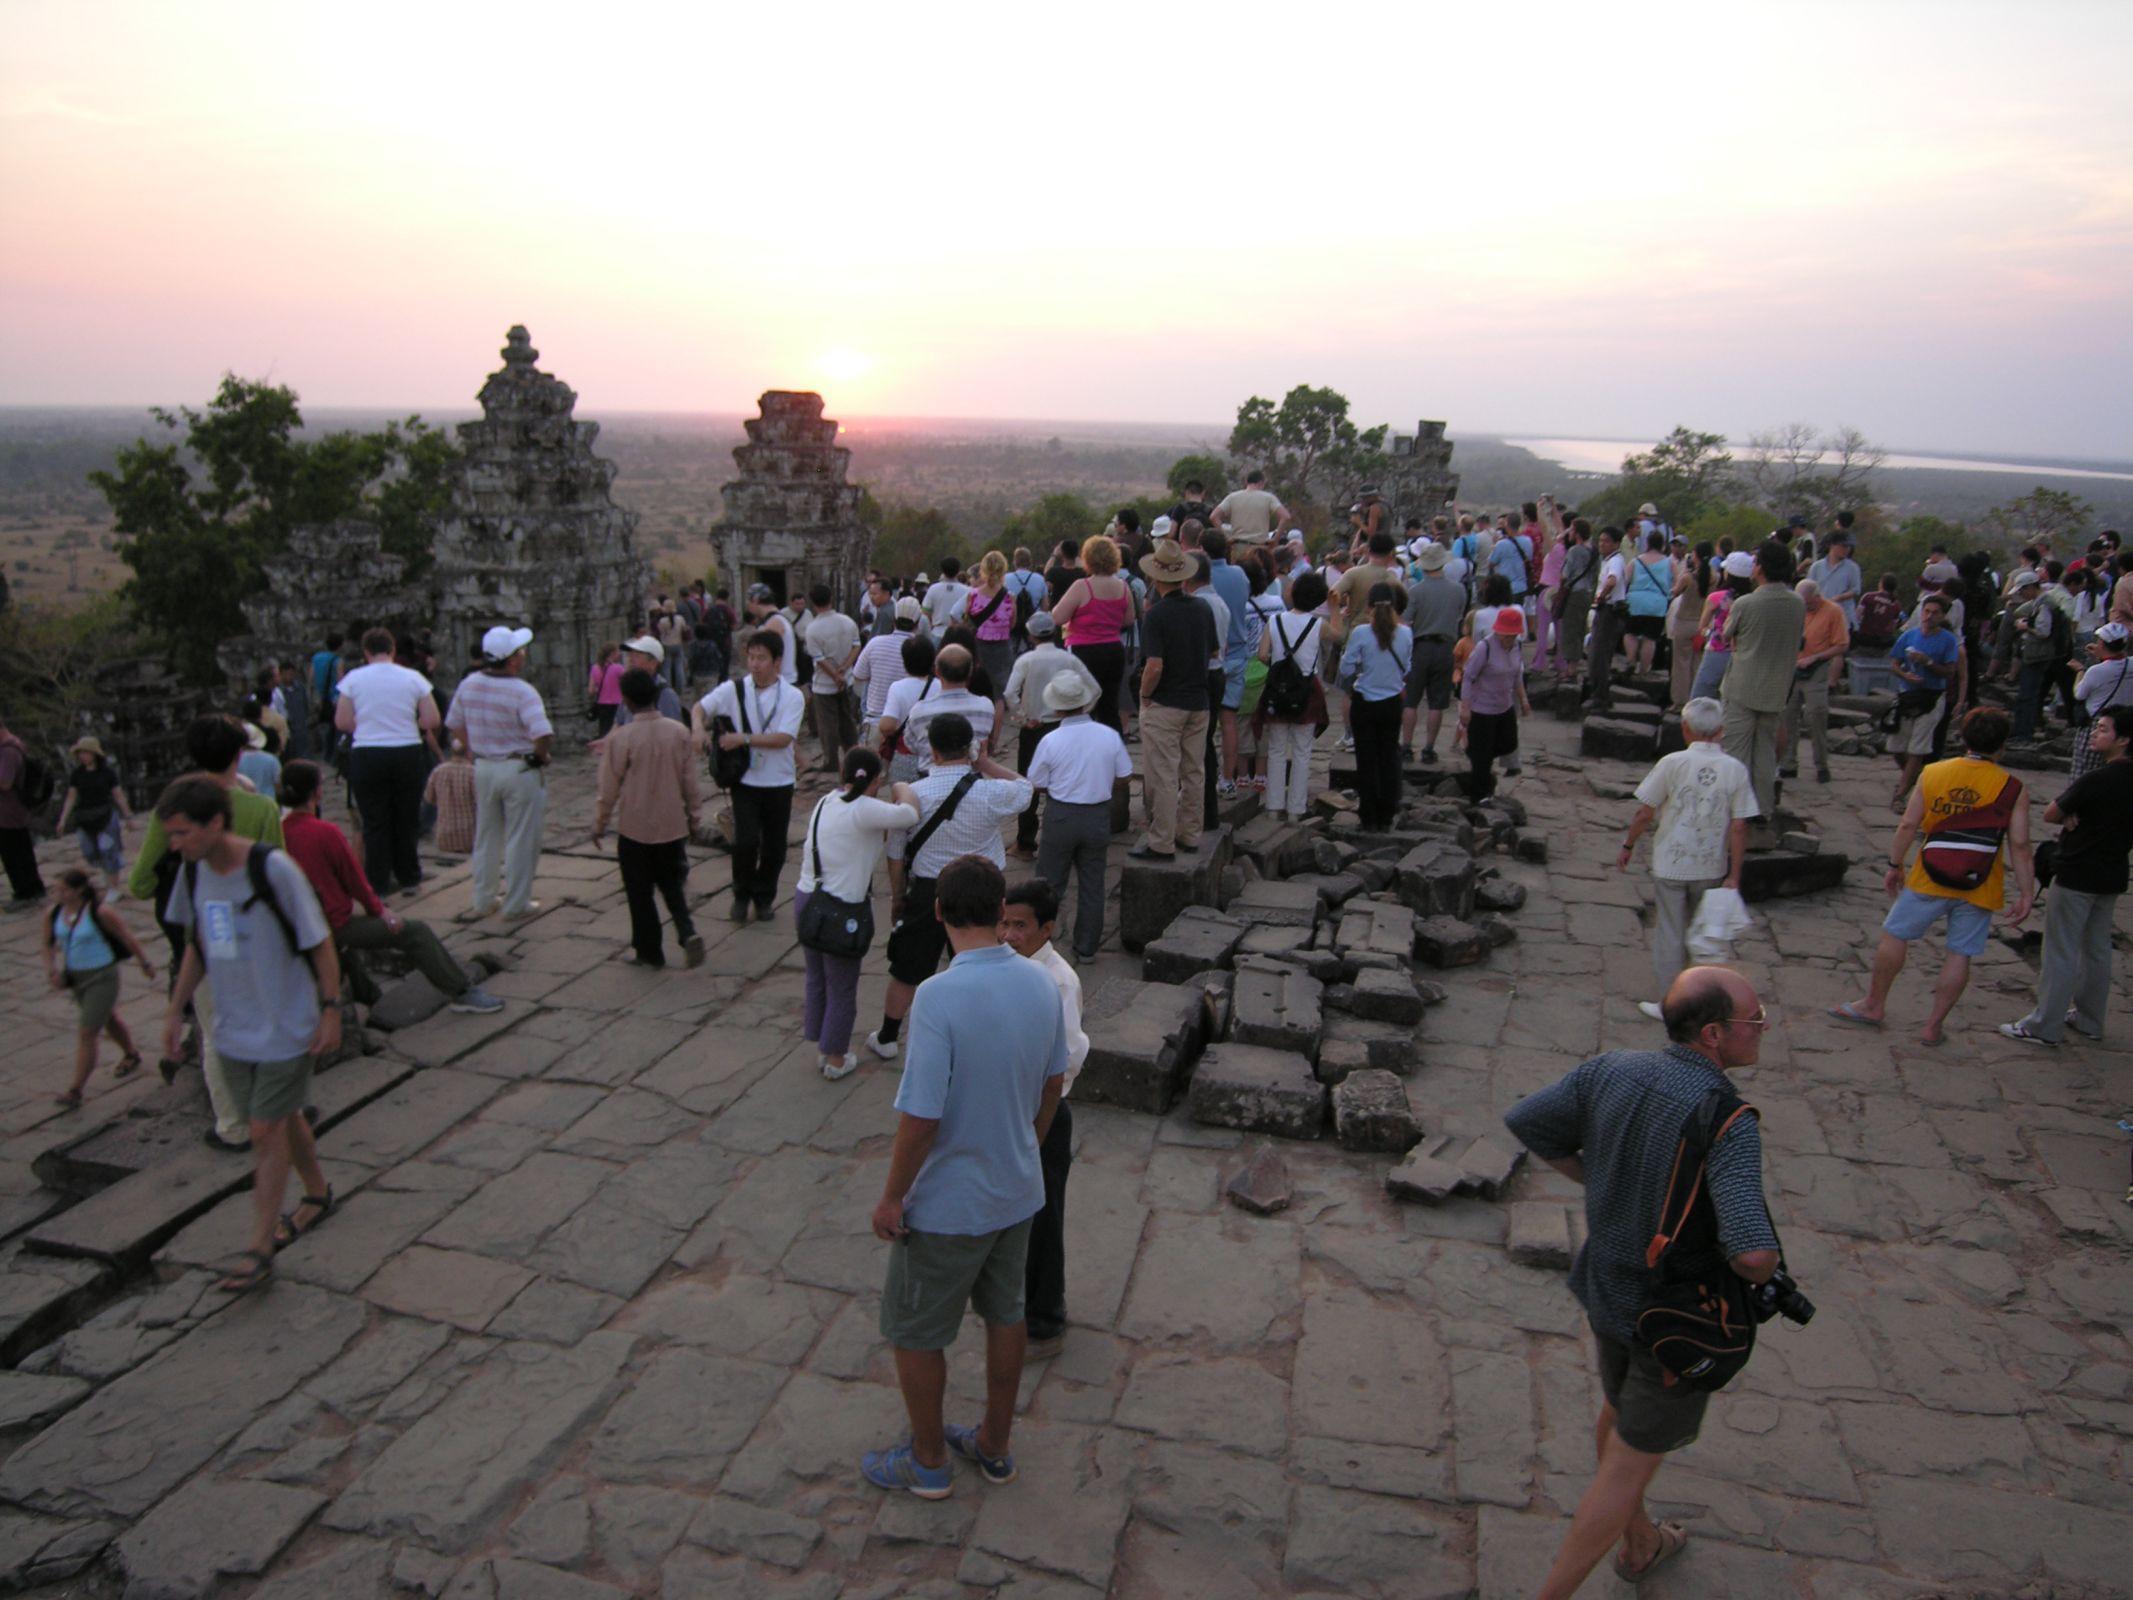 Phnom Bakheng, tourists at sundown 2005